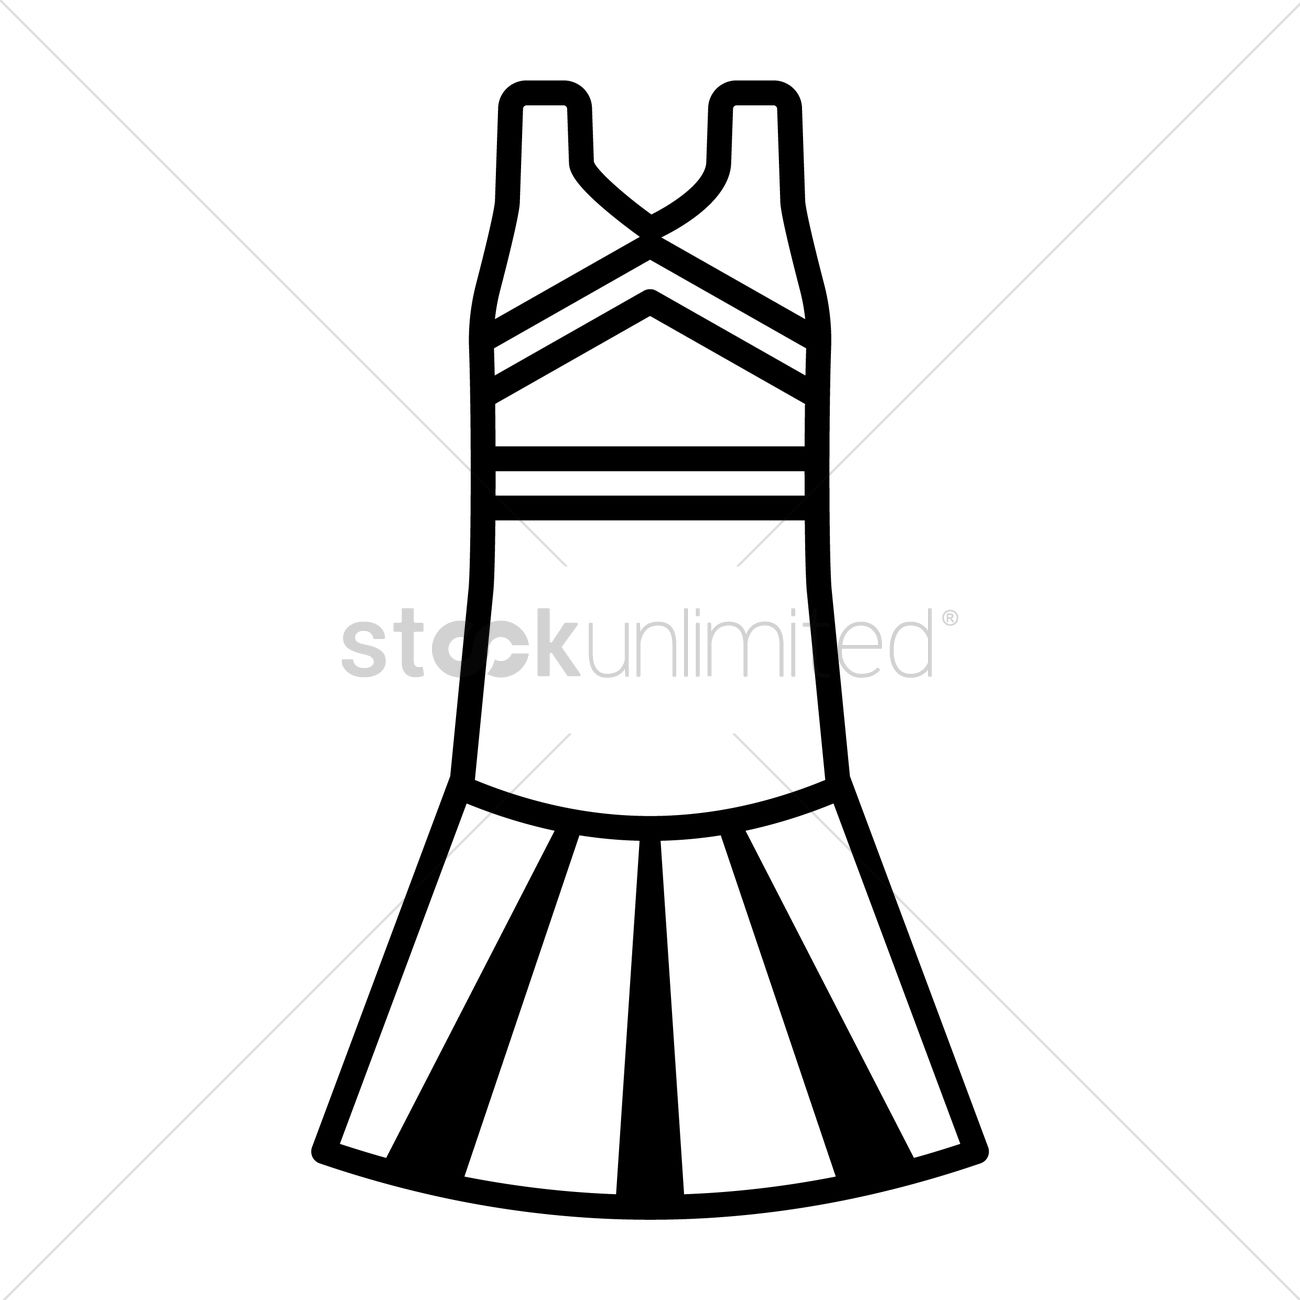 Cheerleader Graphic